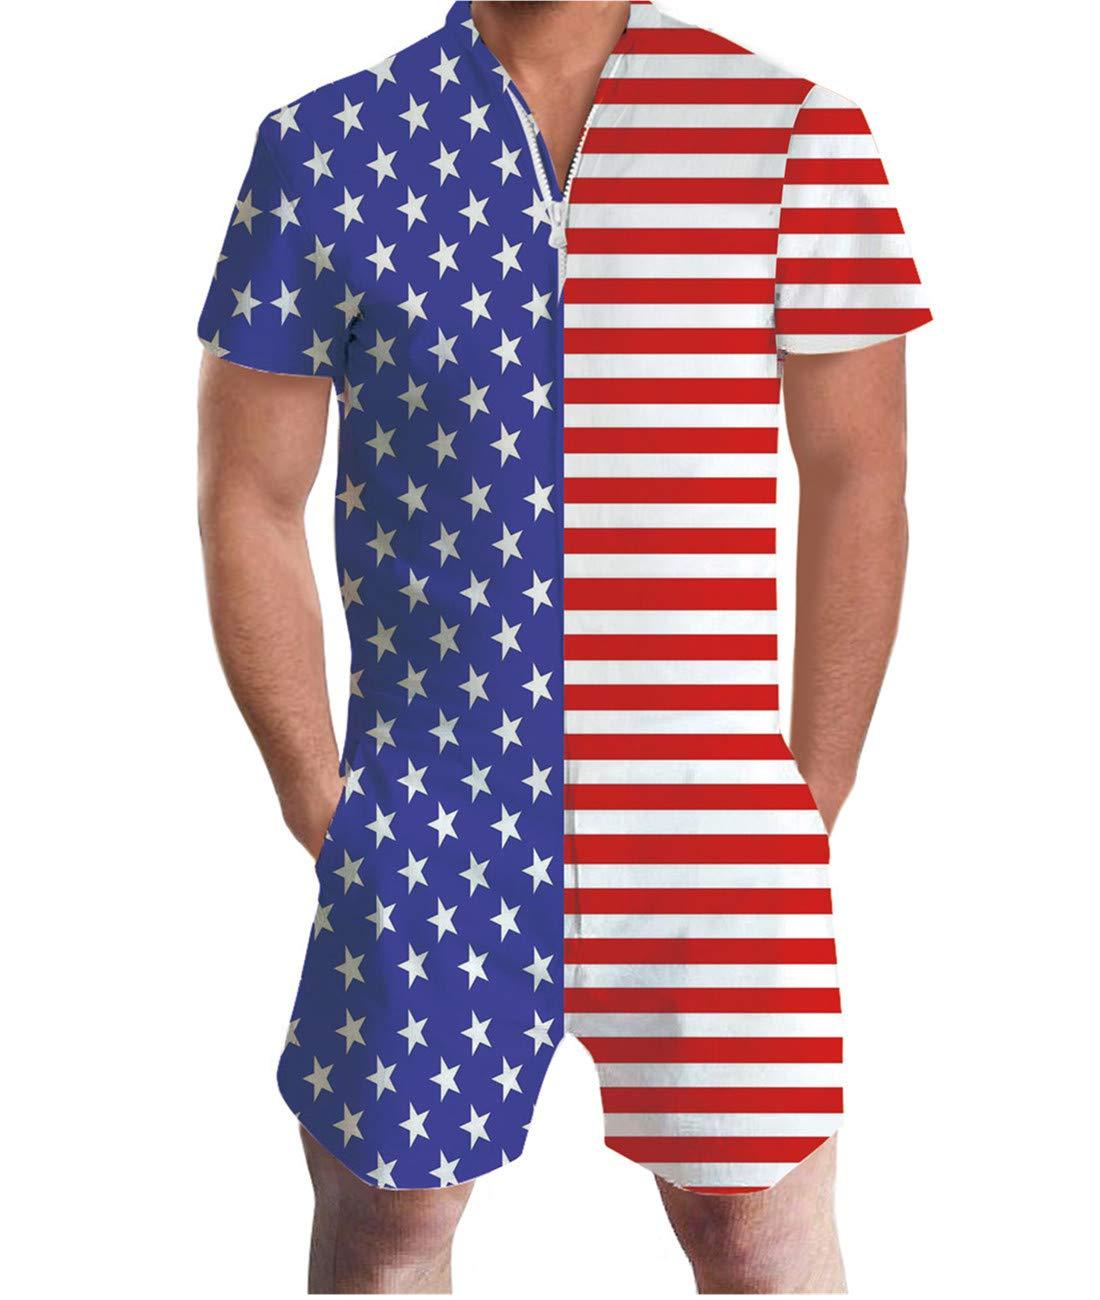 Idgreatim Men 3D Graphic American Flag Short Sleeve Printed One Piece Romper Jumpsuit XL